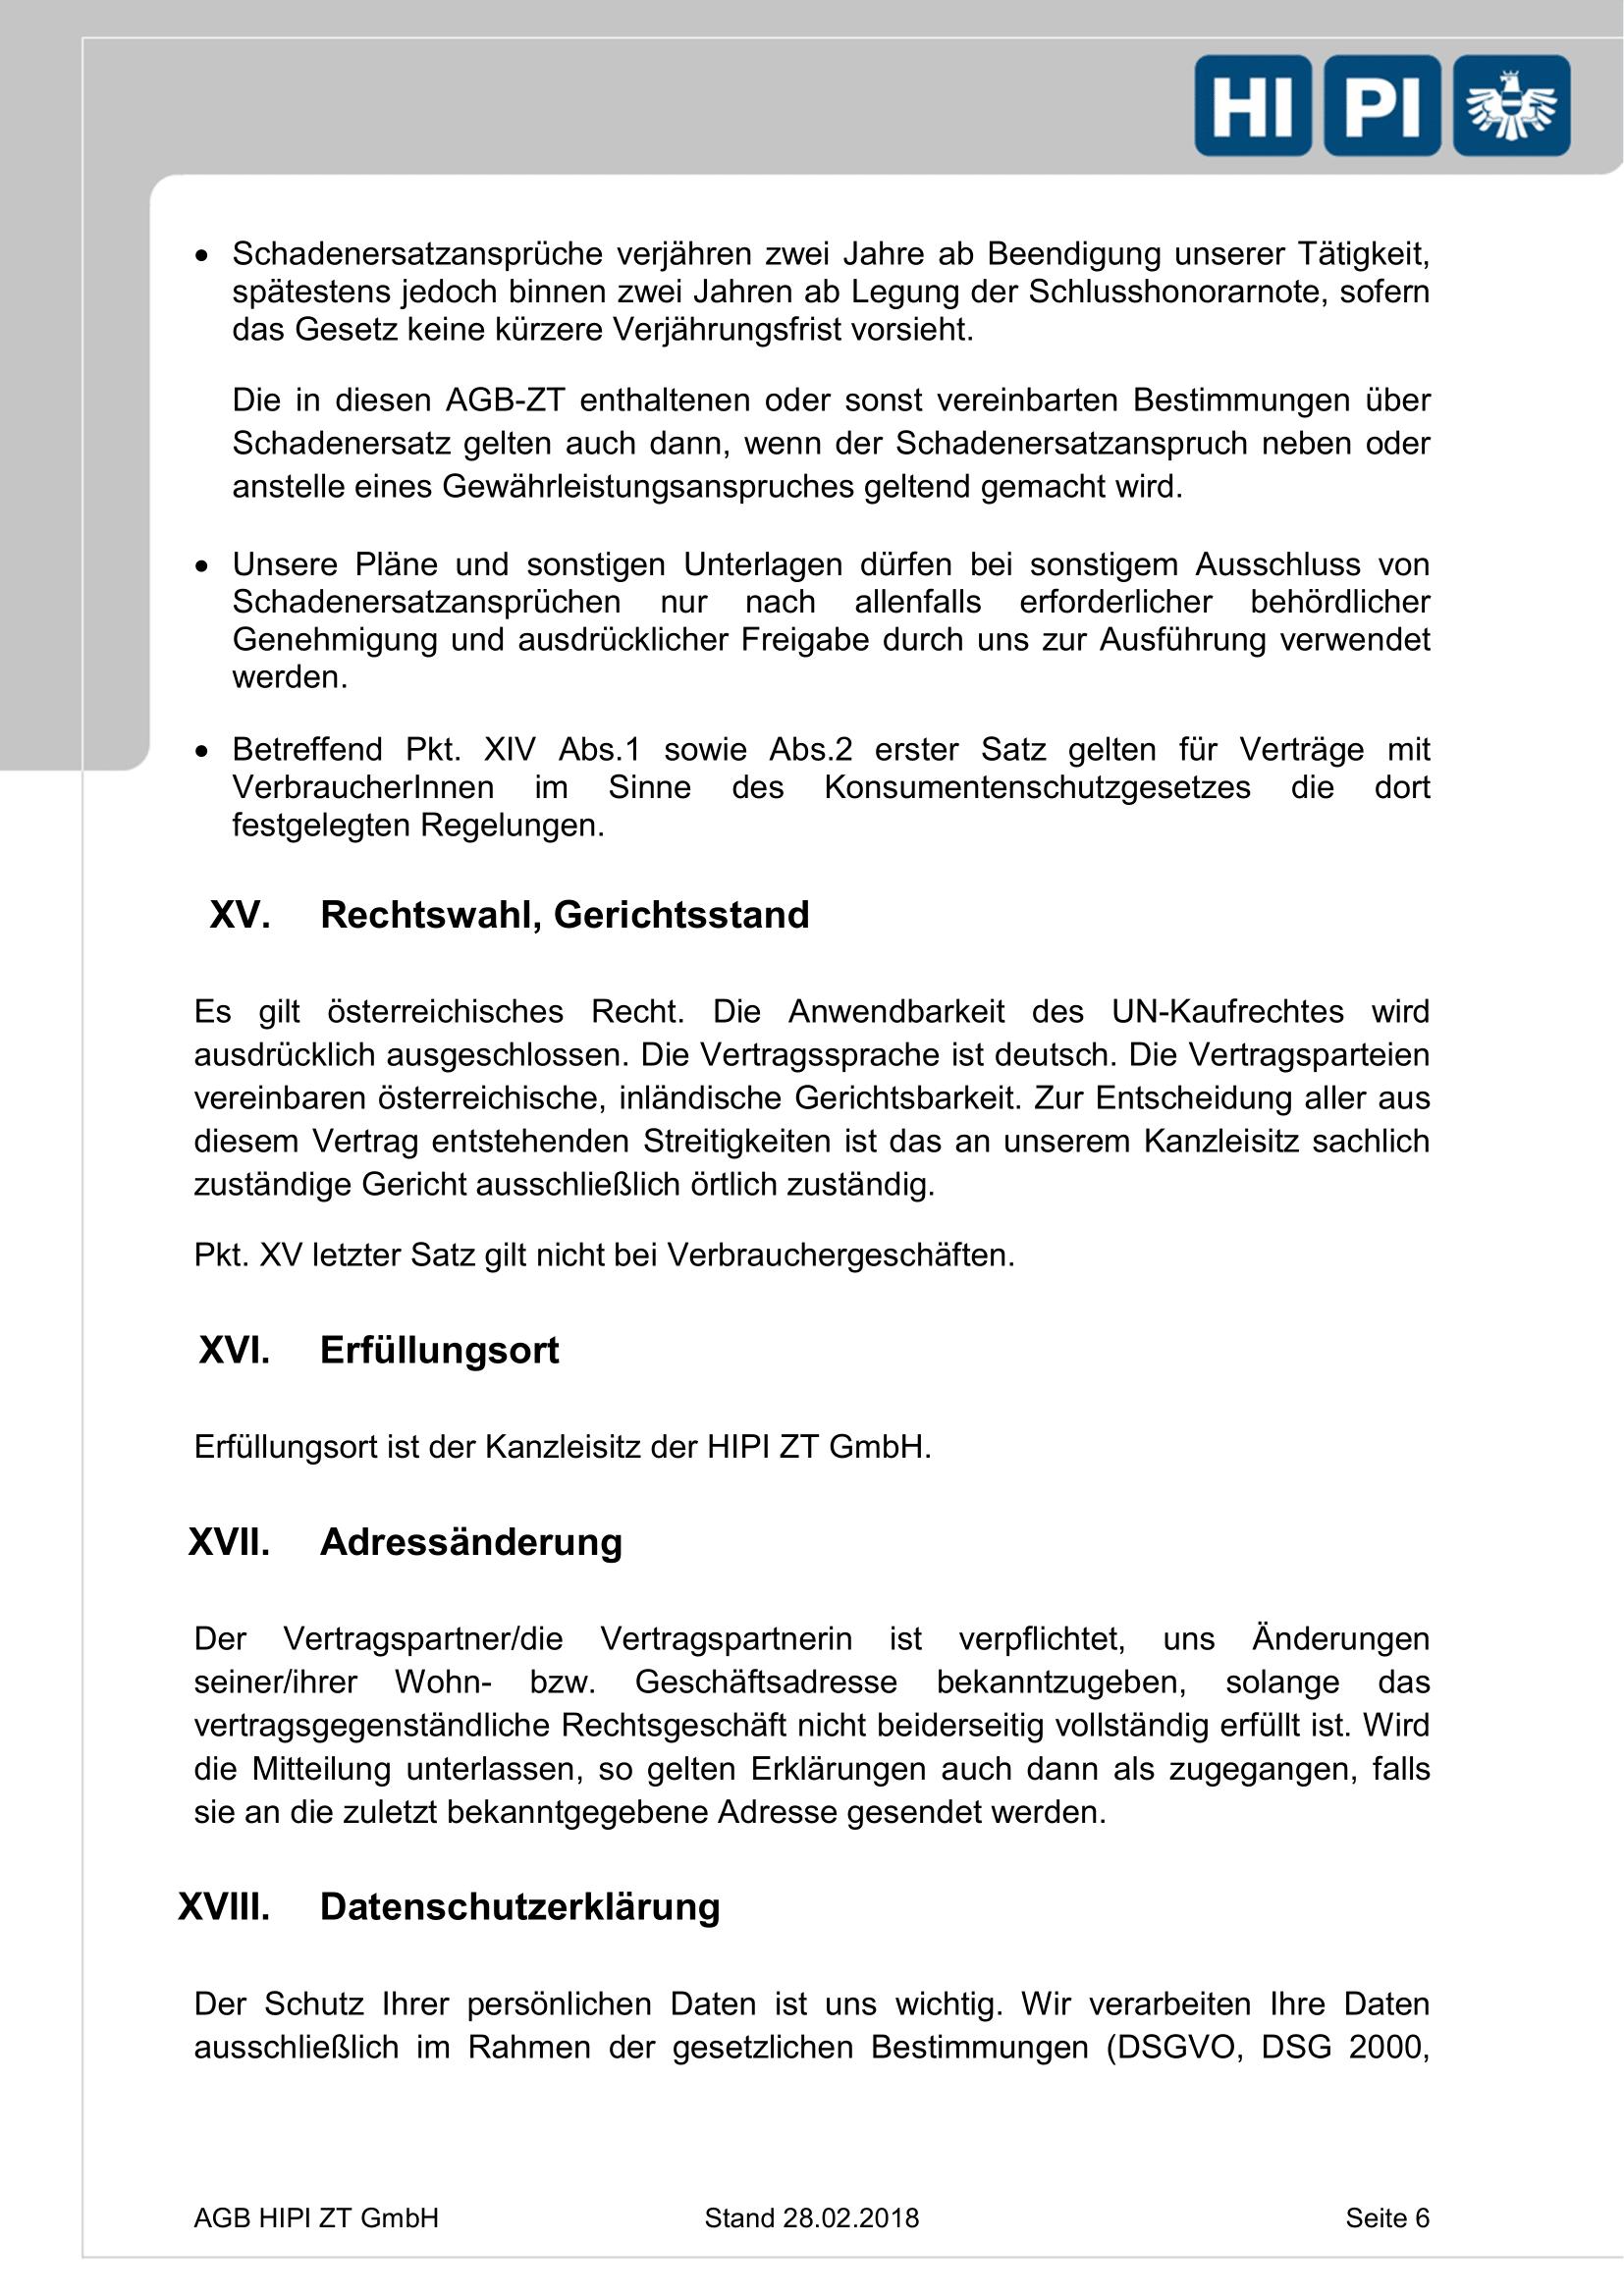 HIPI ZT GmbH AGB Seite 6